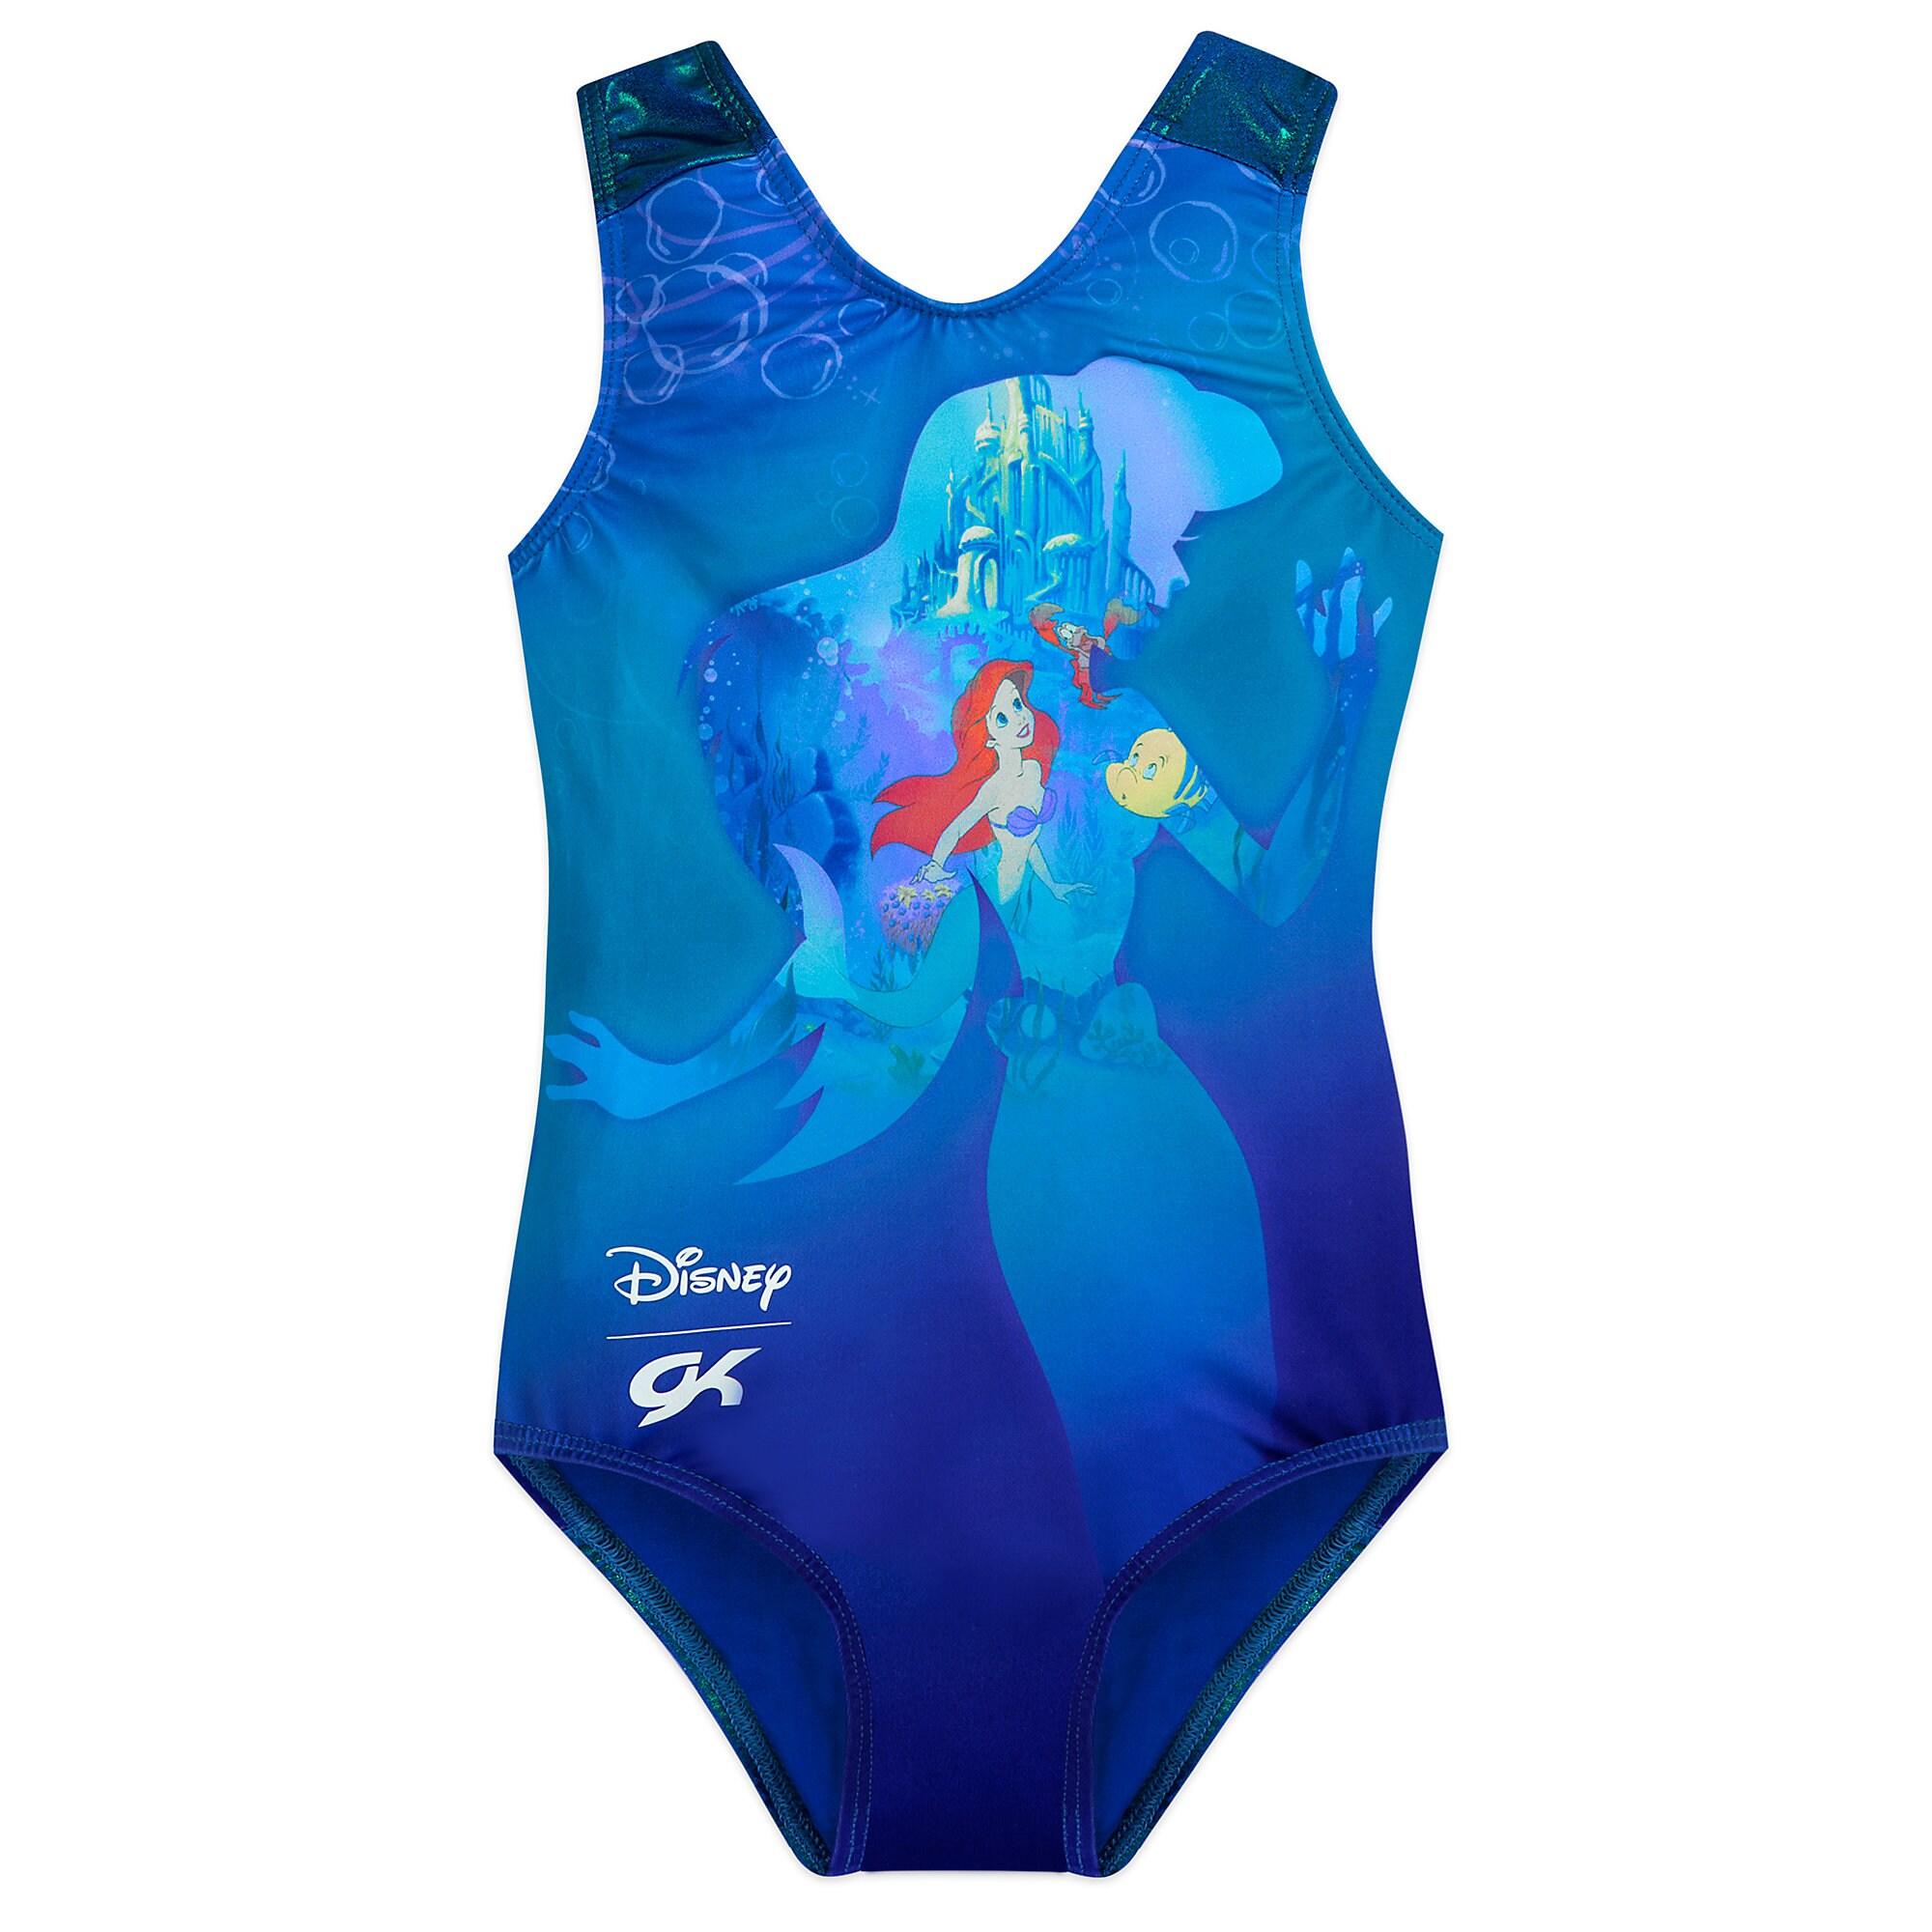 62110ad9cd5f The Little Mermaid Leotard - Girls